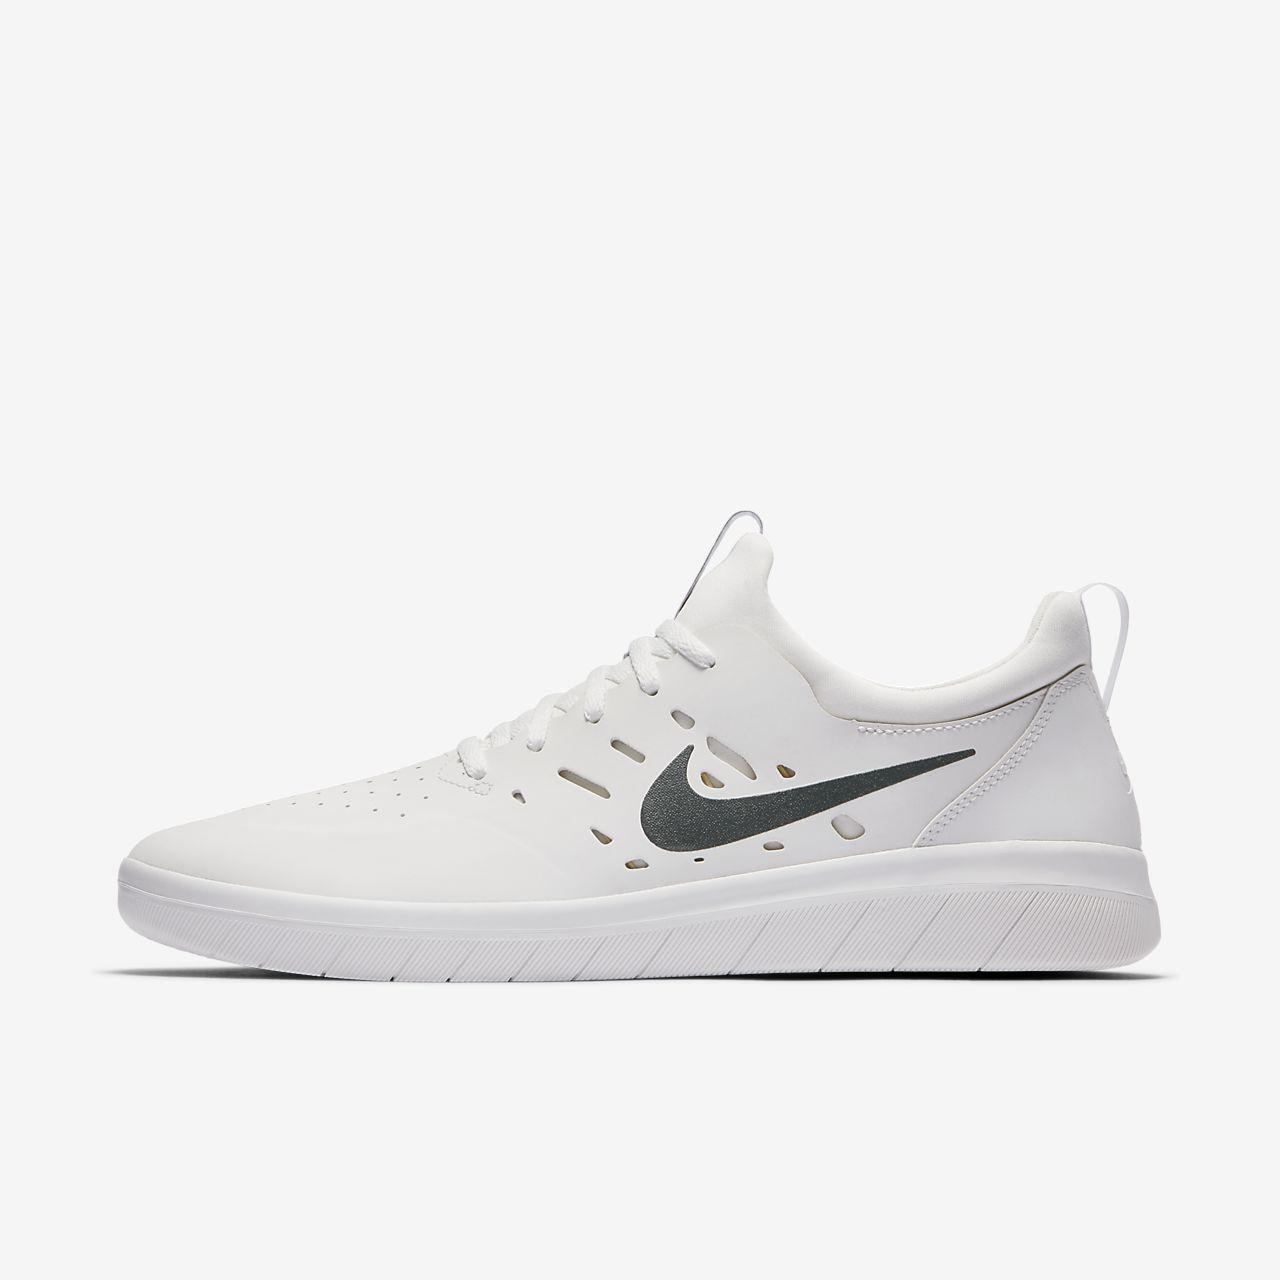 new product fb6a7 8c3ec ... Skateboardsko Nike SB Nyjah Free